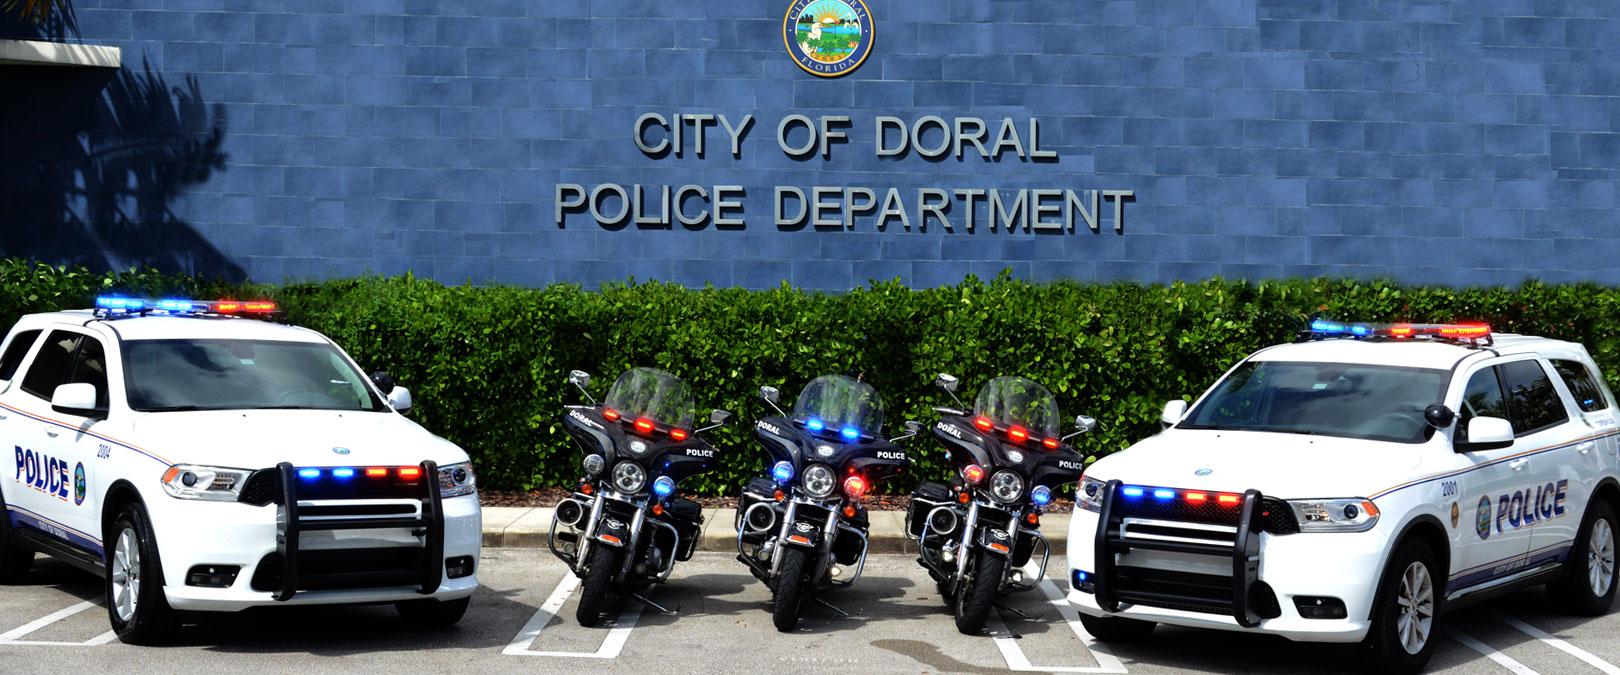 Doral Police Department